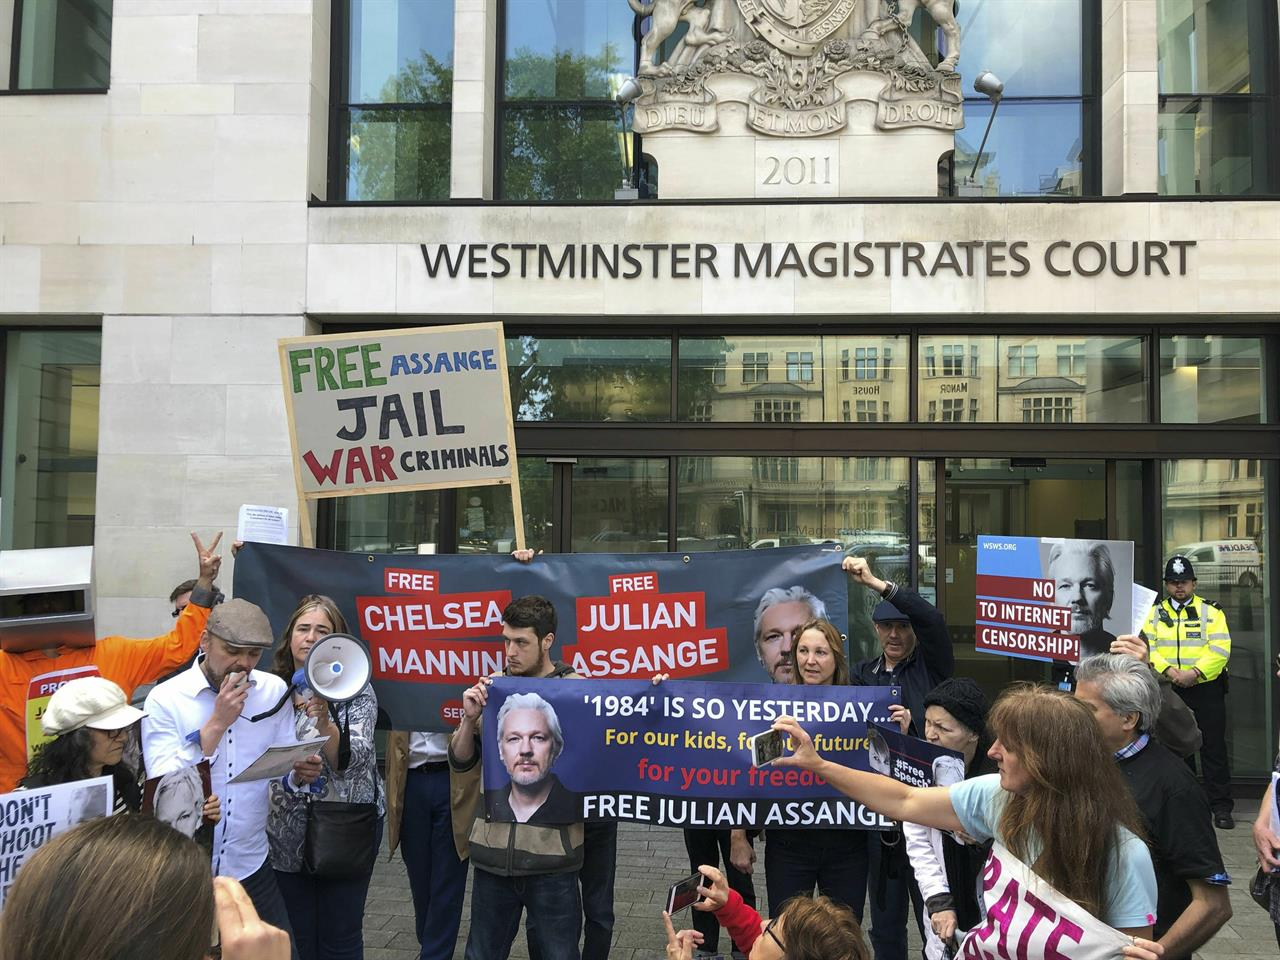 Assange at Westminster Magistrates